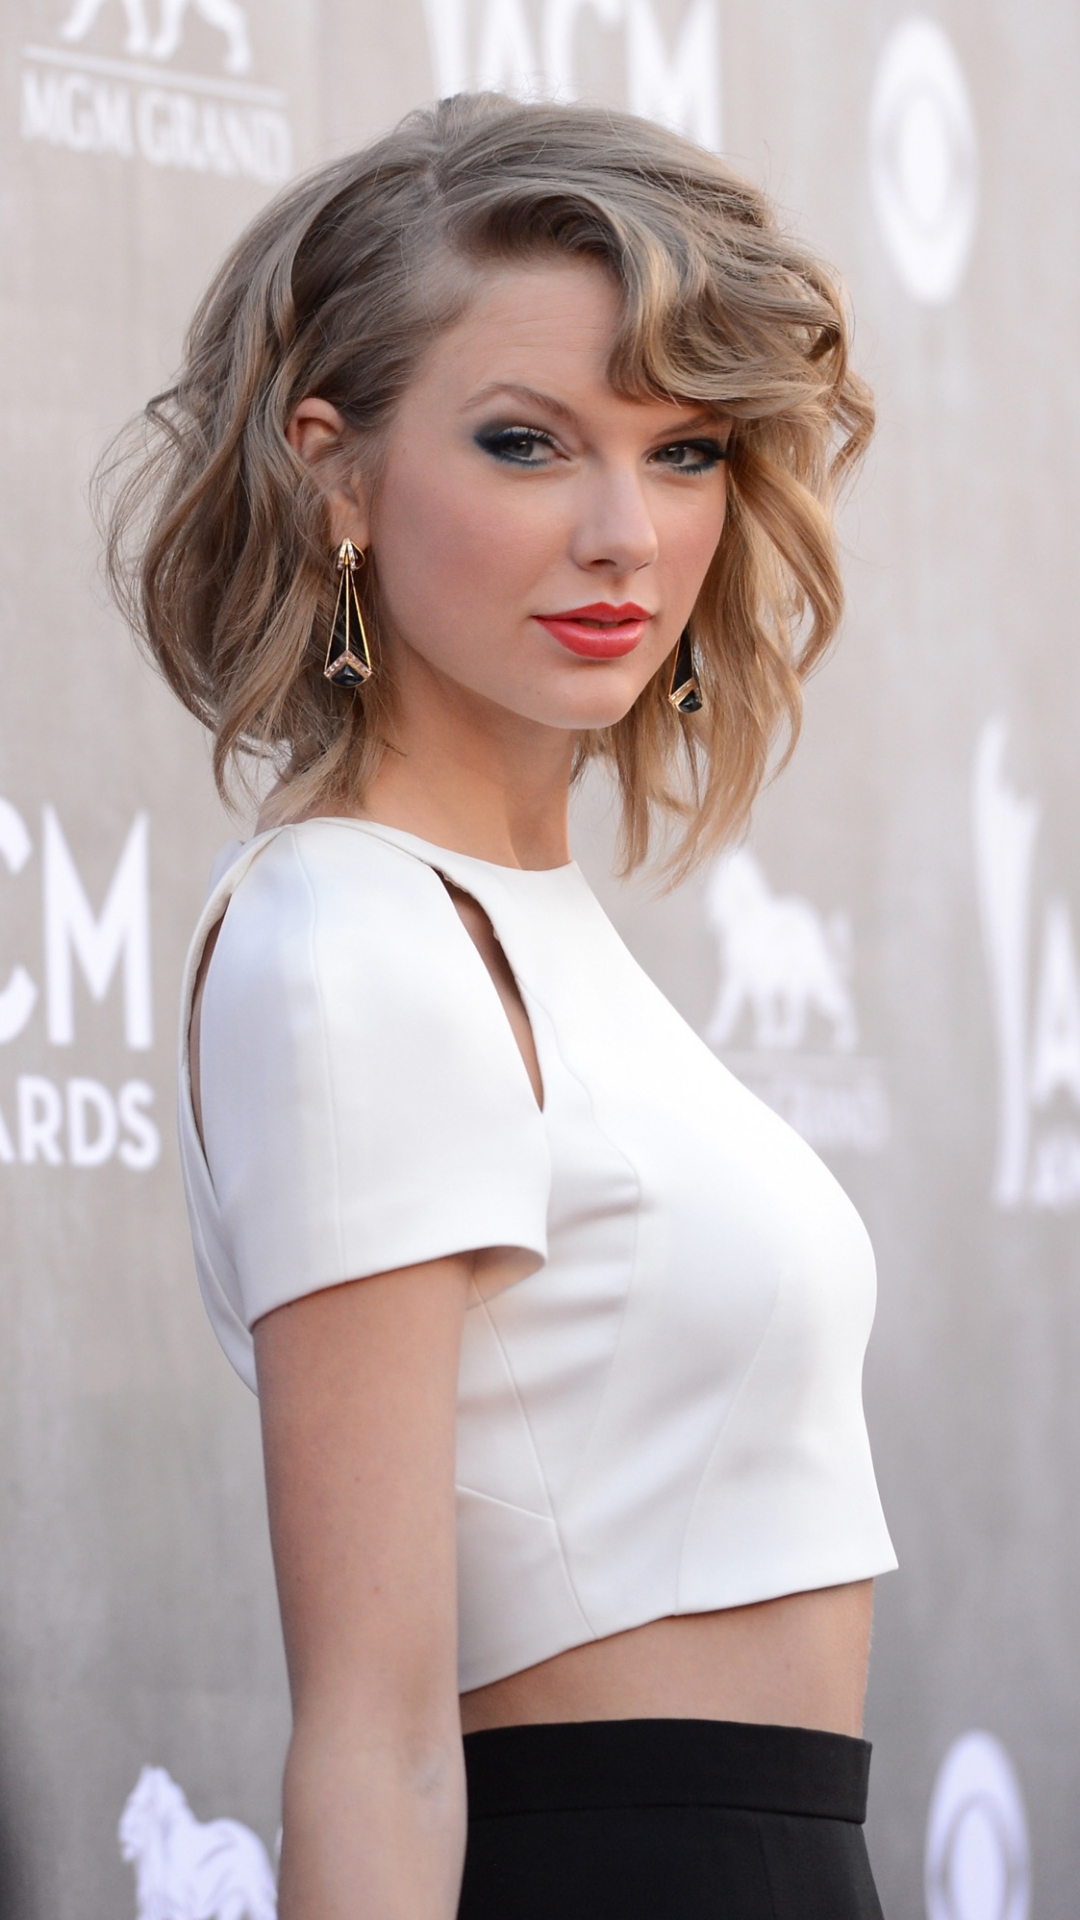 Taylor swift phone wallpaper impre media - Taylor swift wallpaper iphone ...